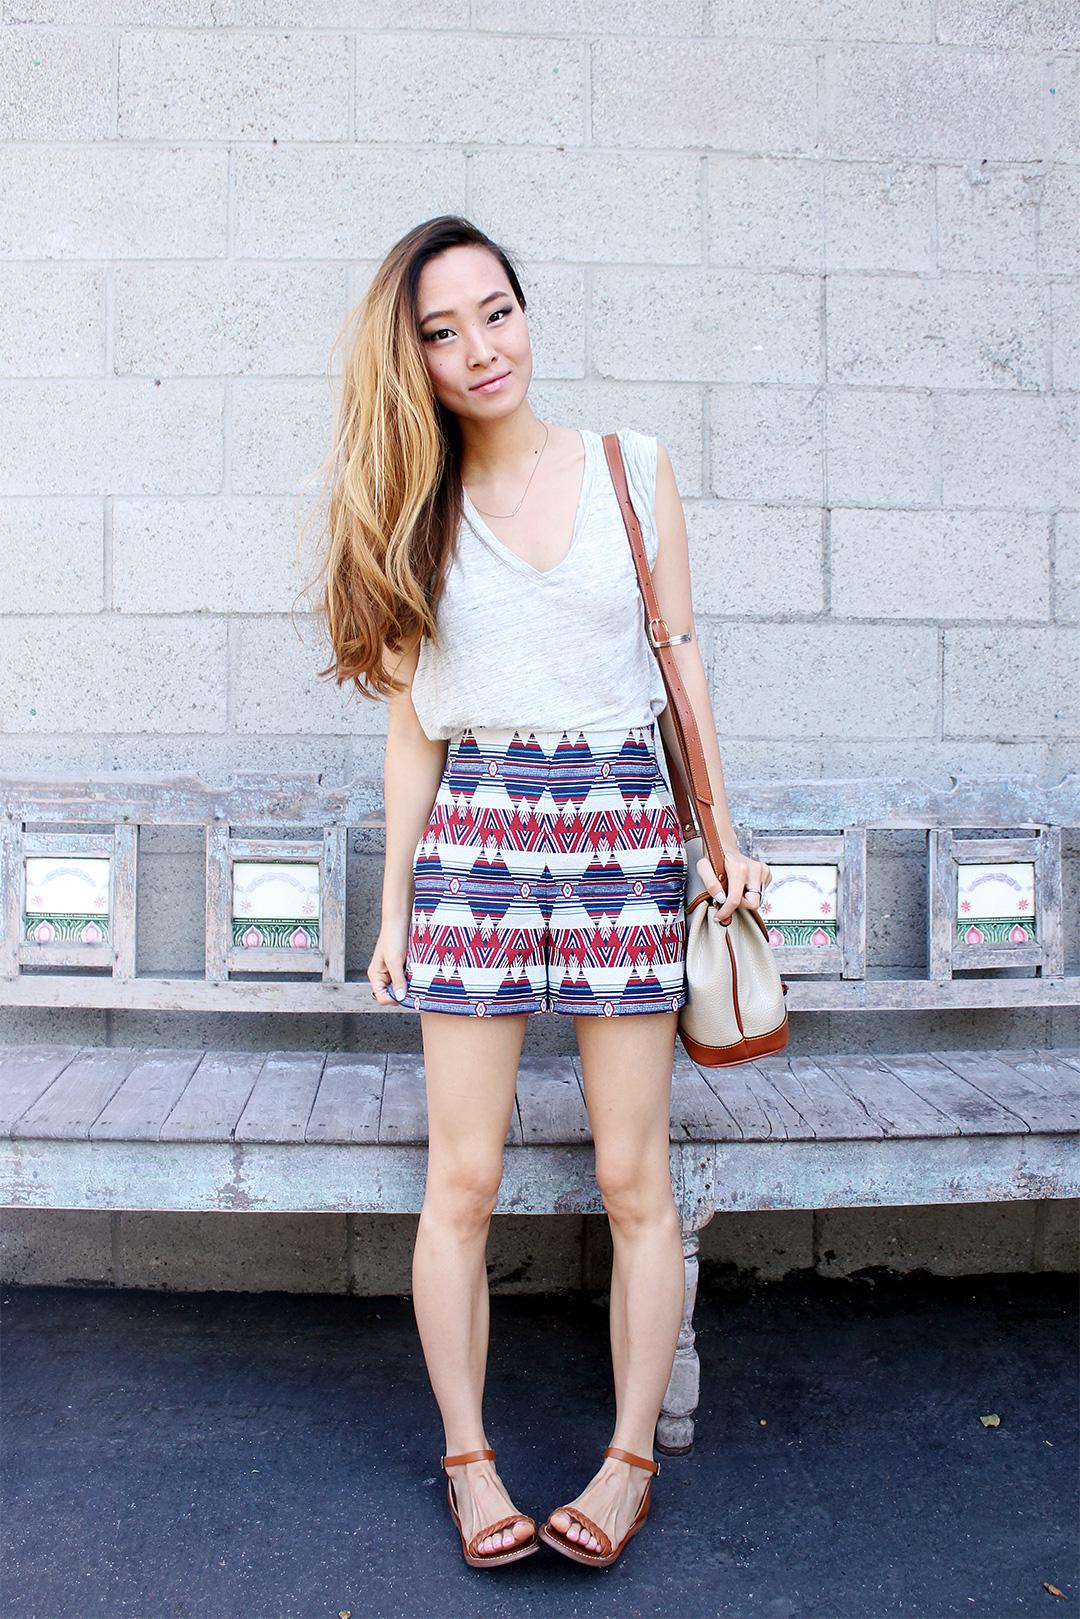 Madewell shirt and shoes, Zara Shorts, Dooney & Bourke Bag